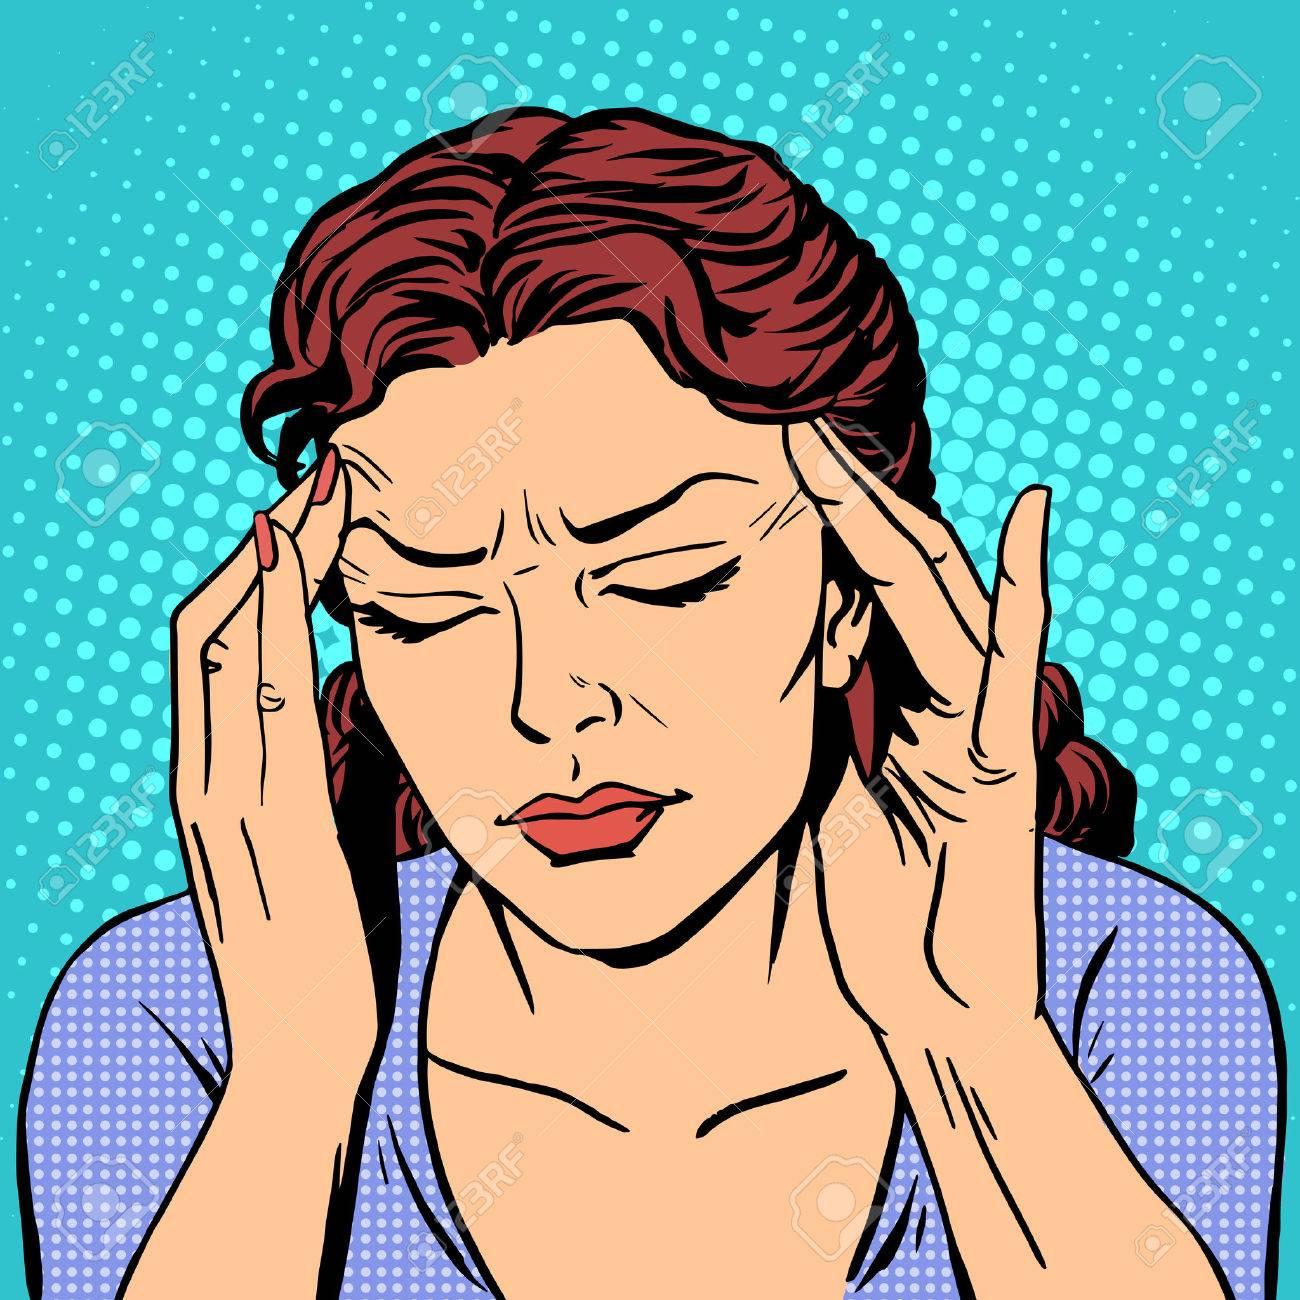 Headache health medicine woman pop art retro style - 46967739